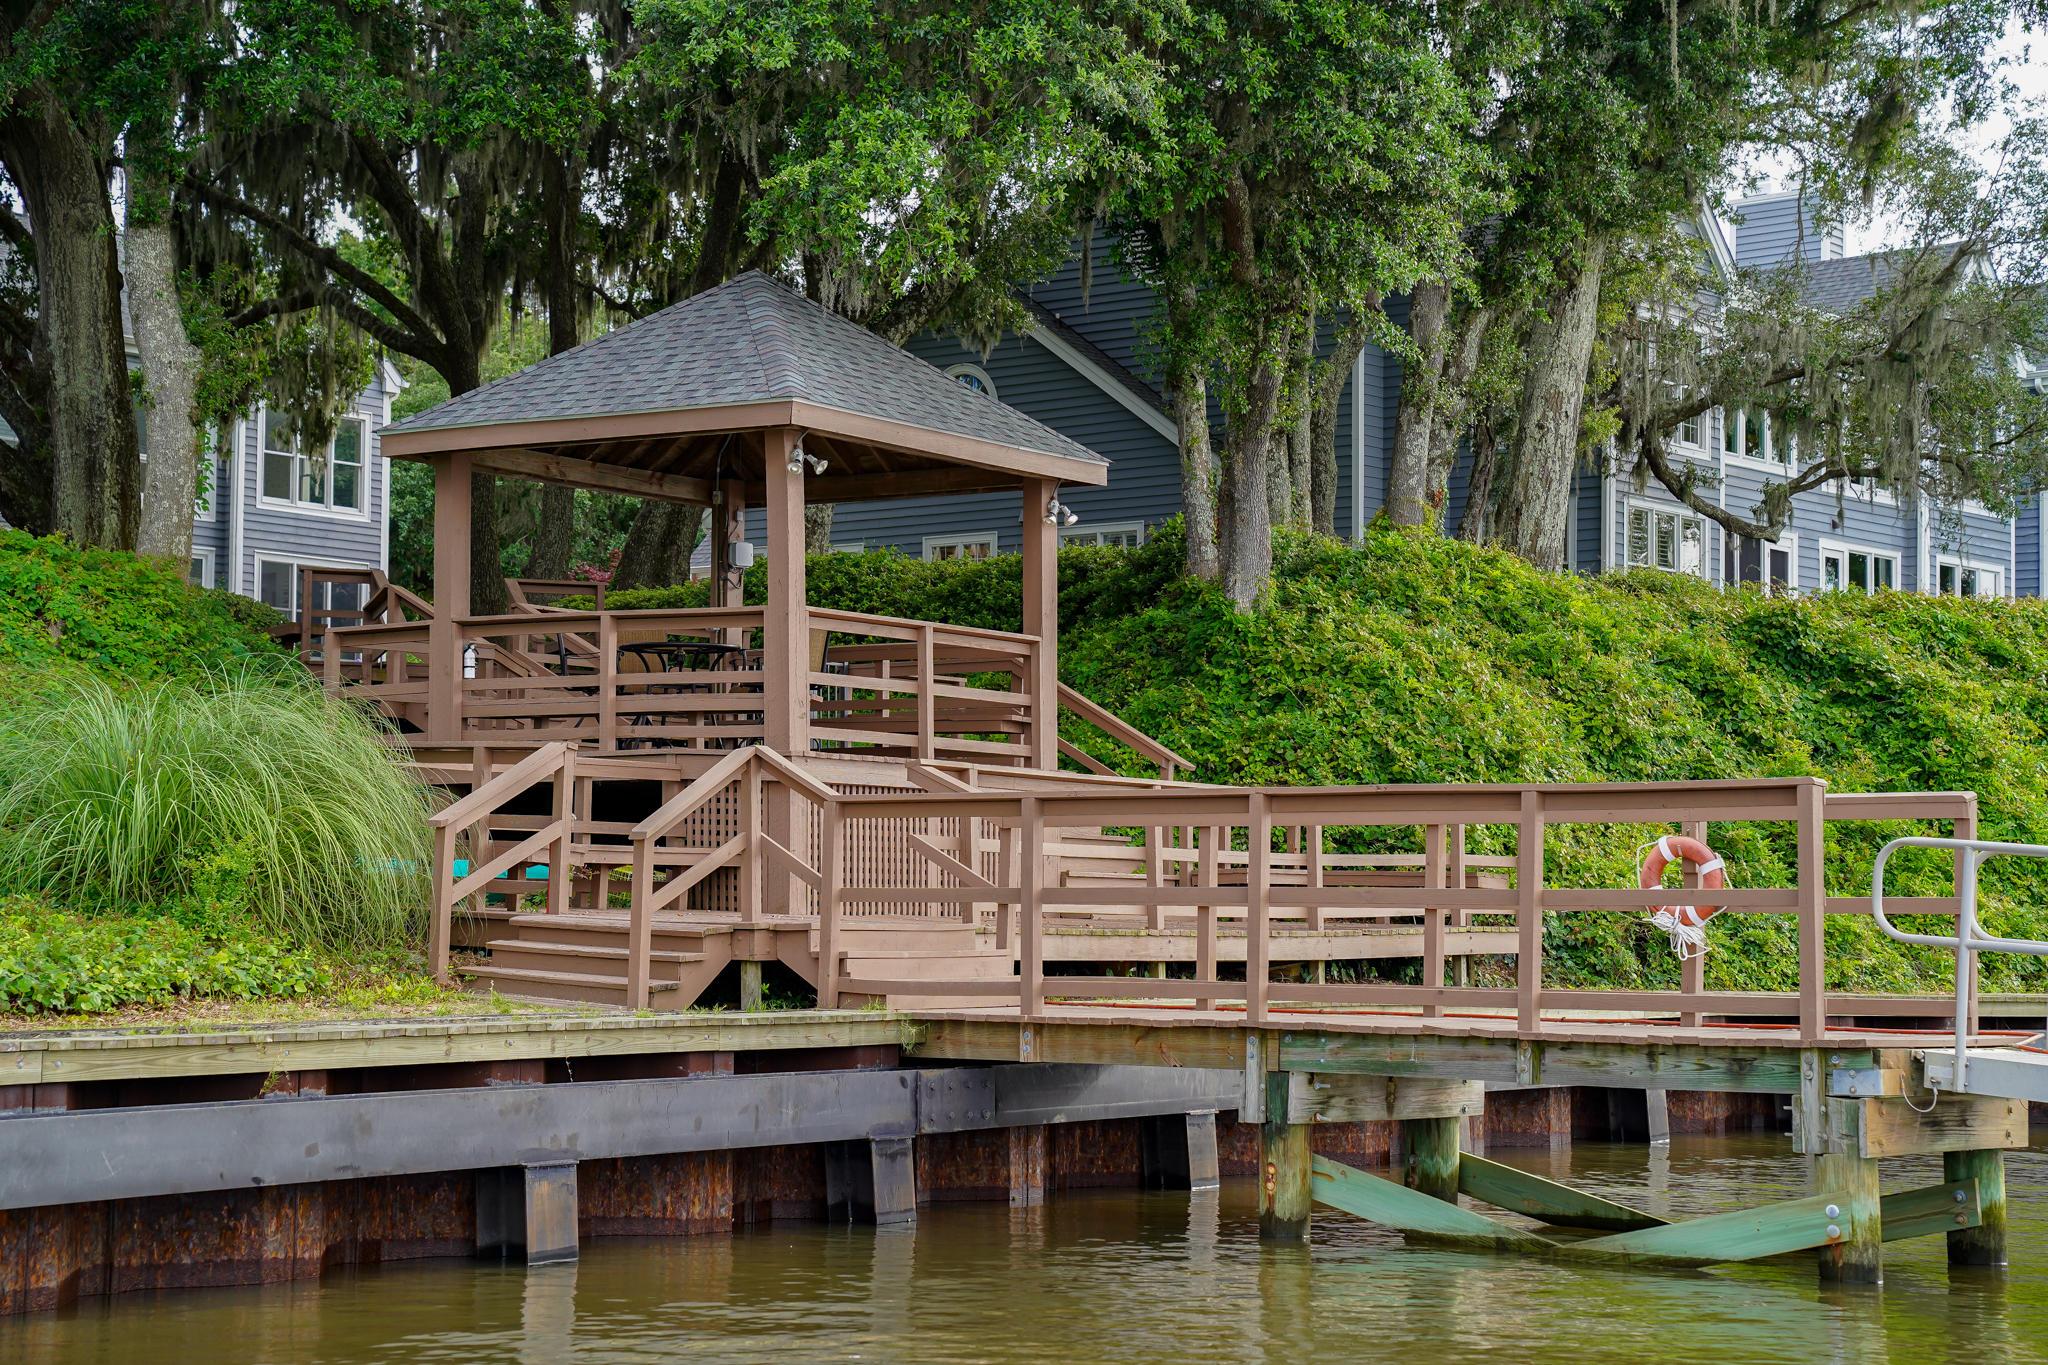 Waterfront Plantation Homes For Sale - 112 Waterfront Plantation, Charleston, SC - 47